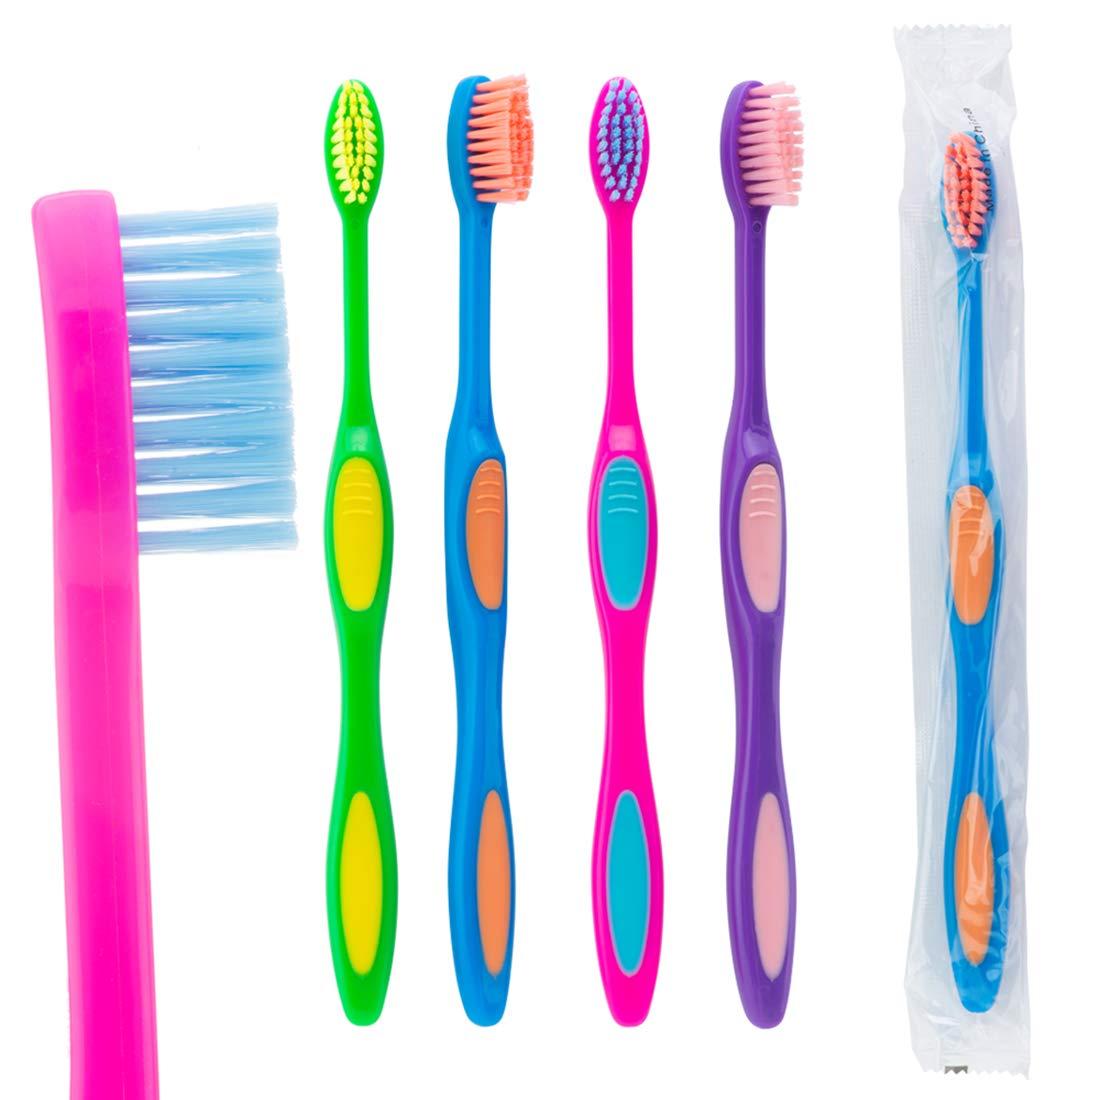 Oraline Genuine Pre-teen Sparkle Popular Grip Toothbrushes - Dental Prod Hygiene